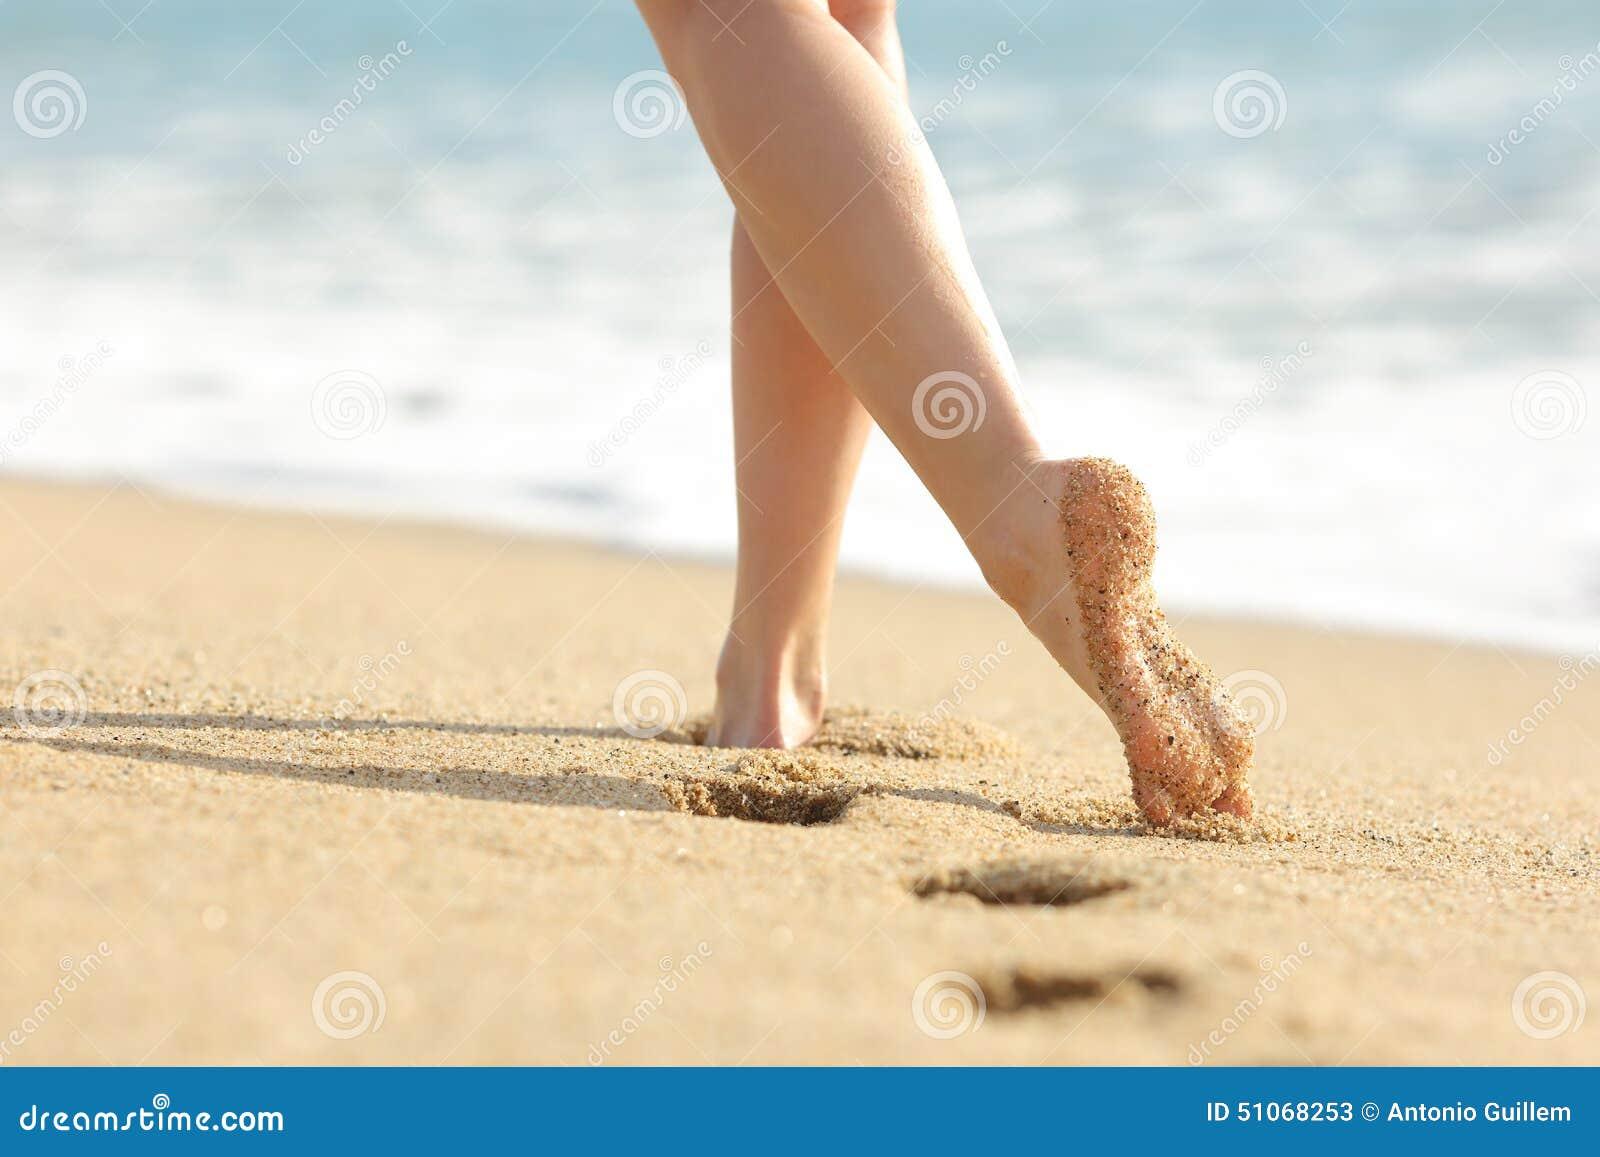 Fille chaude jambes et pieds